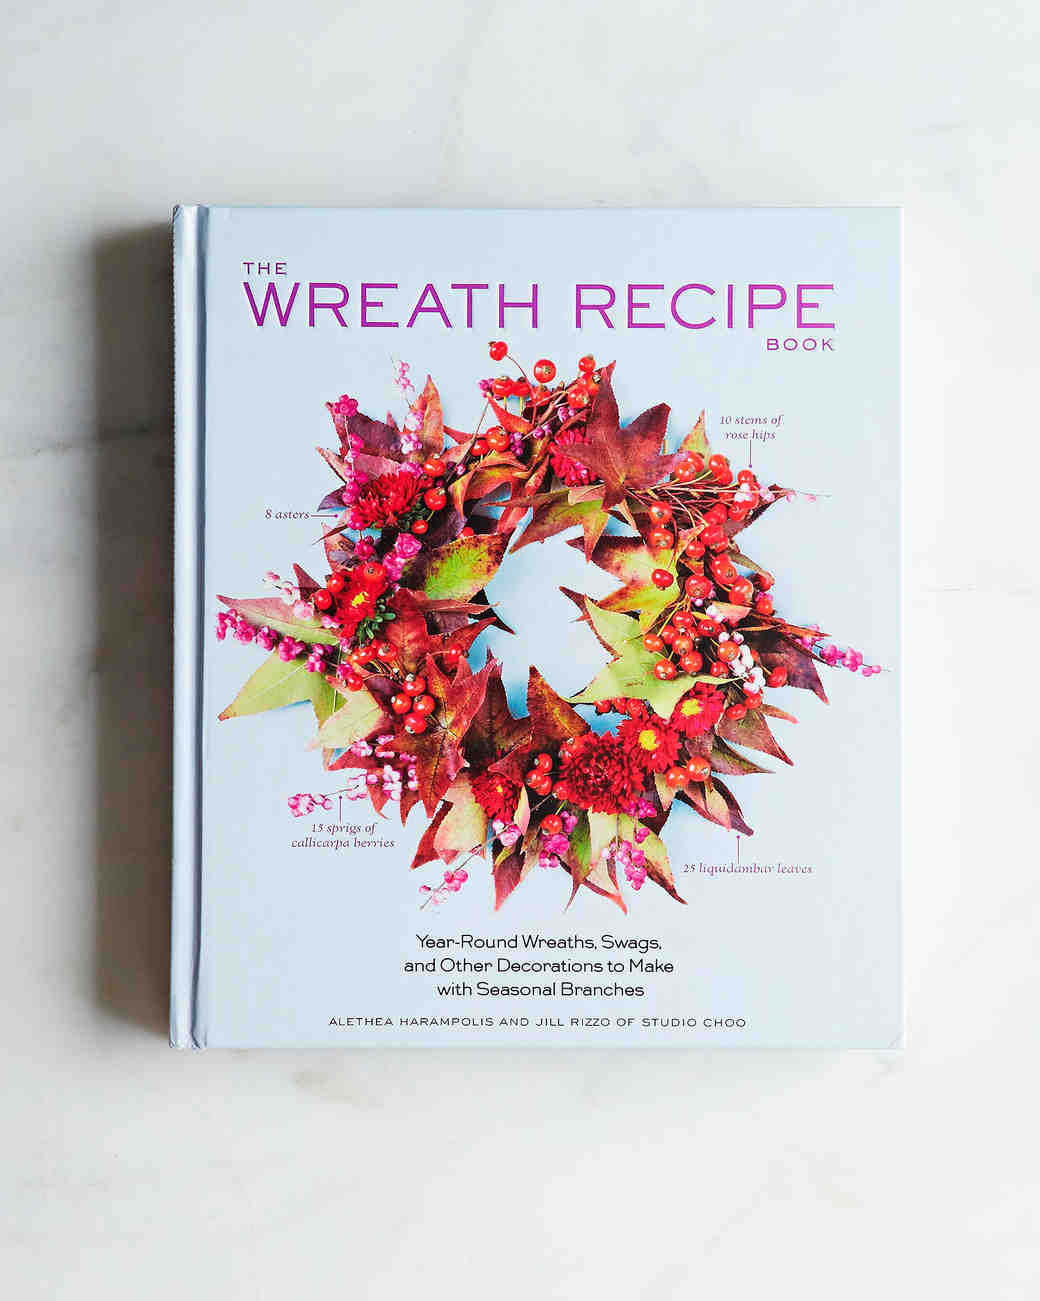 hostess-gifts-wreath-recipe-book-1115.jpg